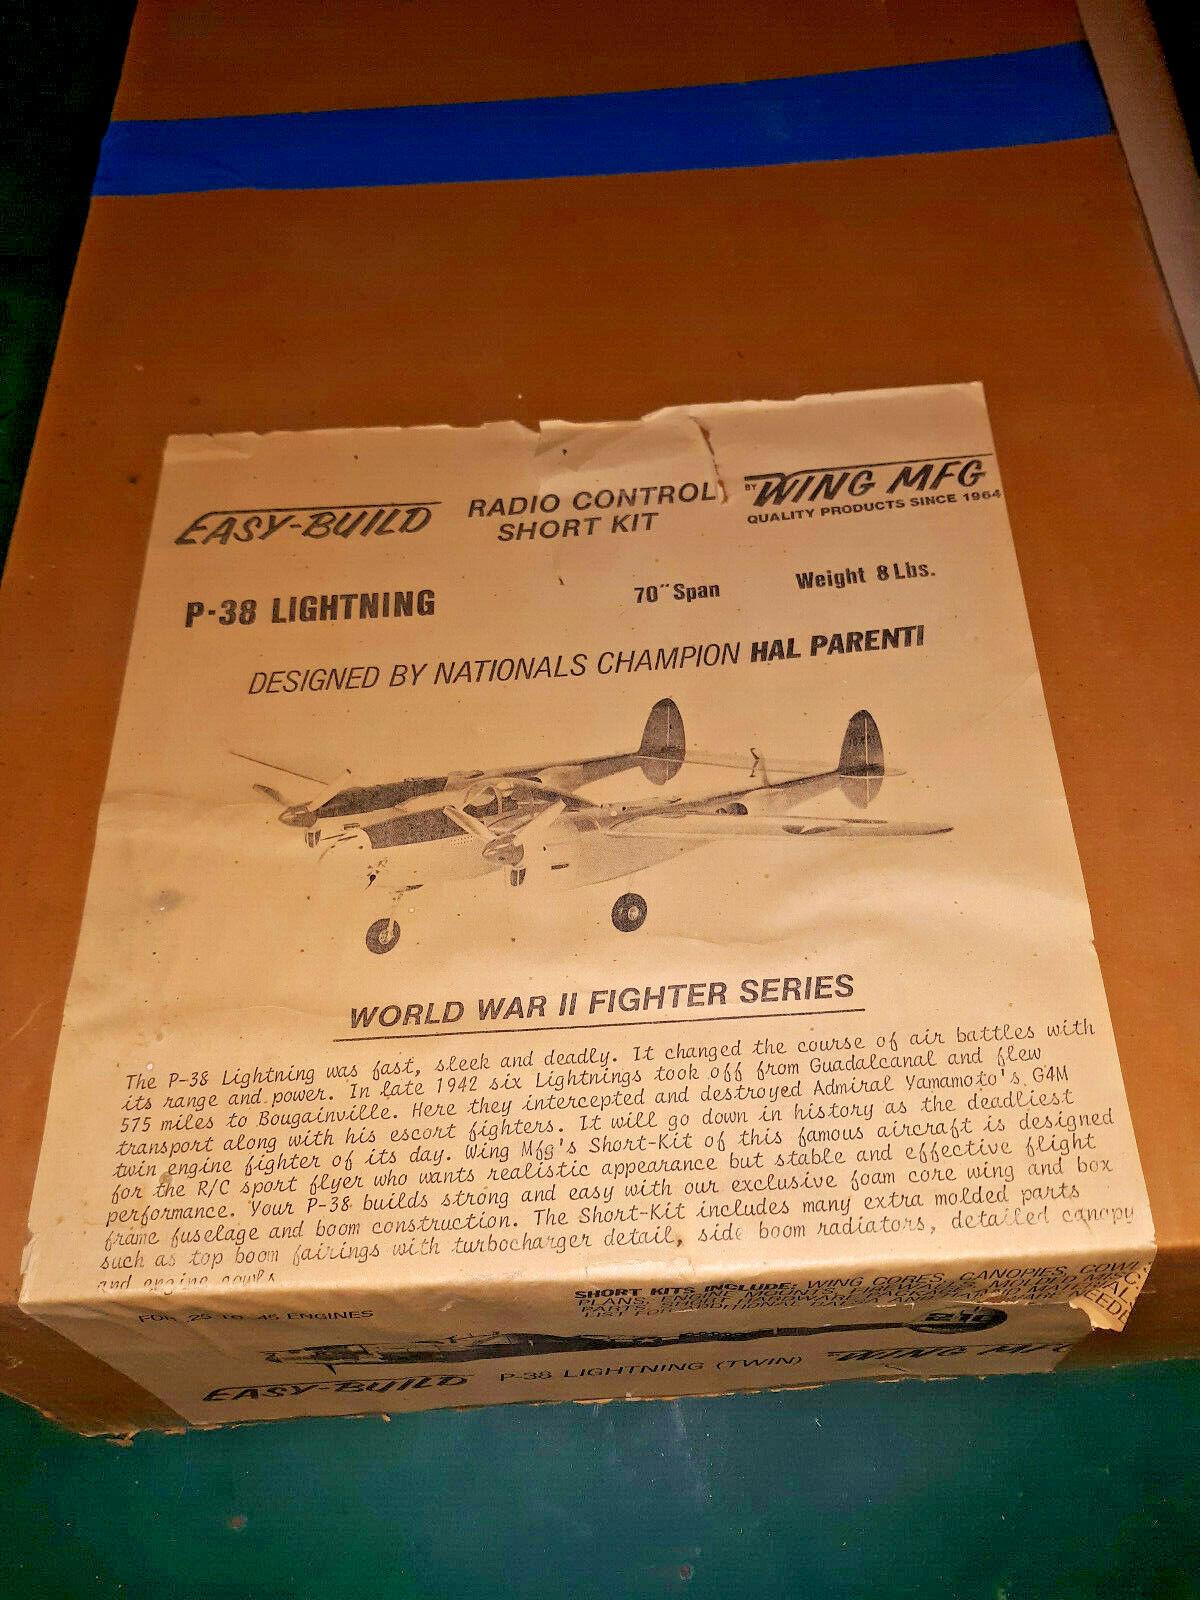 P38 Lightning 70  RC Airplane Kit WING MFG Easy-Build Short Kit vintage